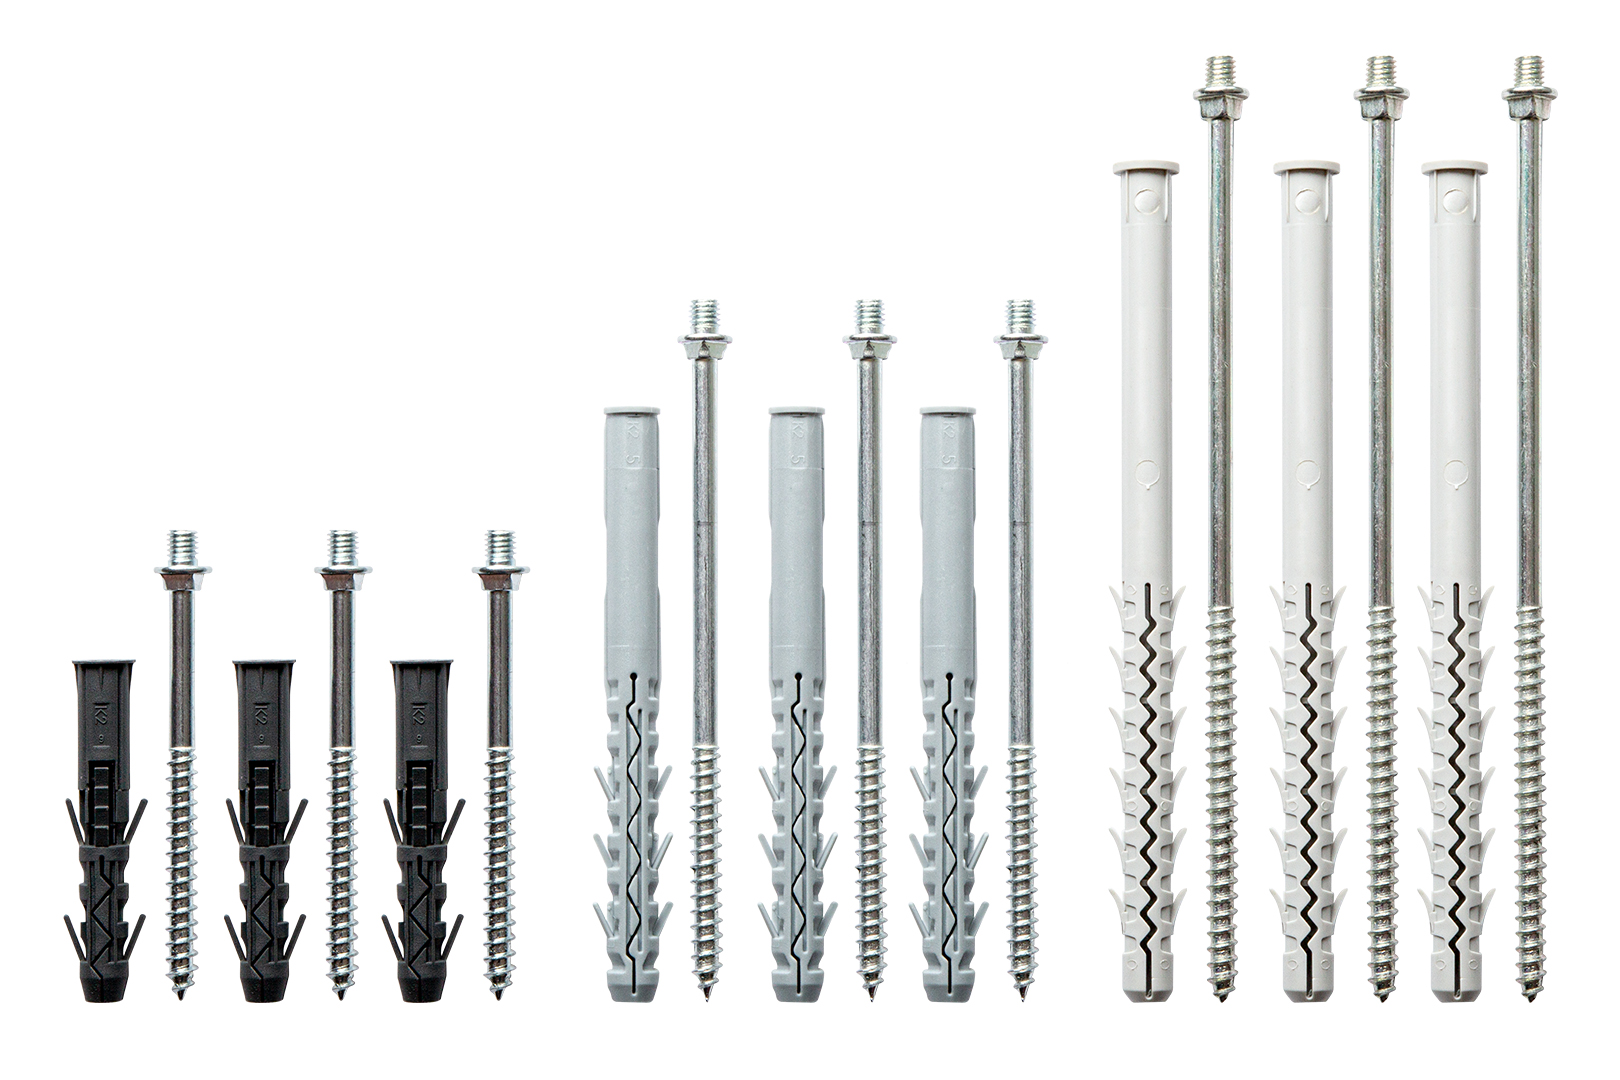 Stockschrauben - inkl. Dübel, perfekt für RainWay Rohrschellen - 10 Stück